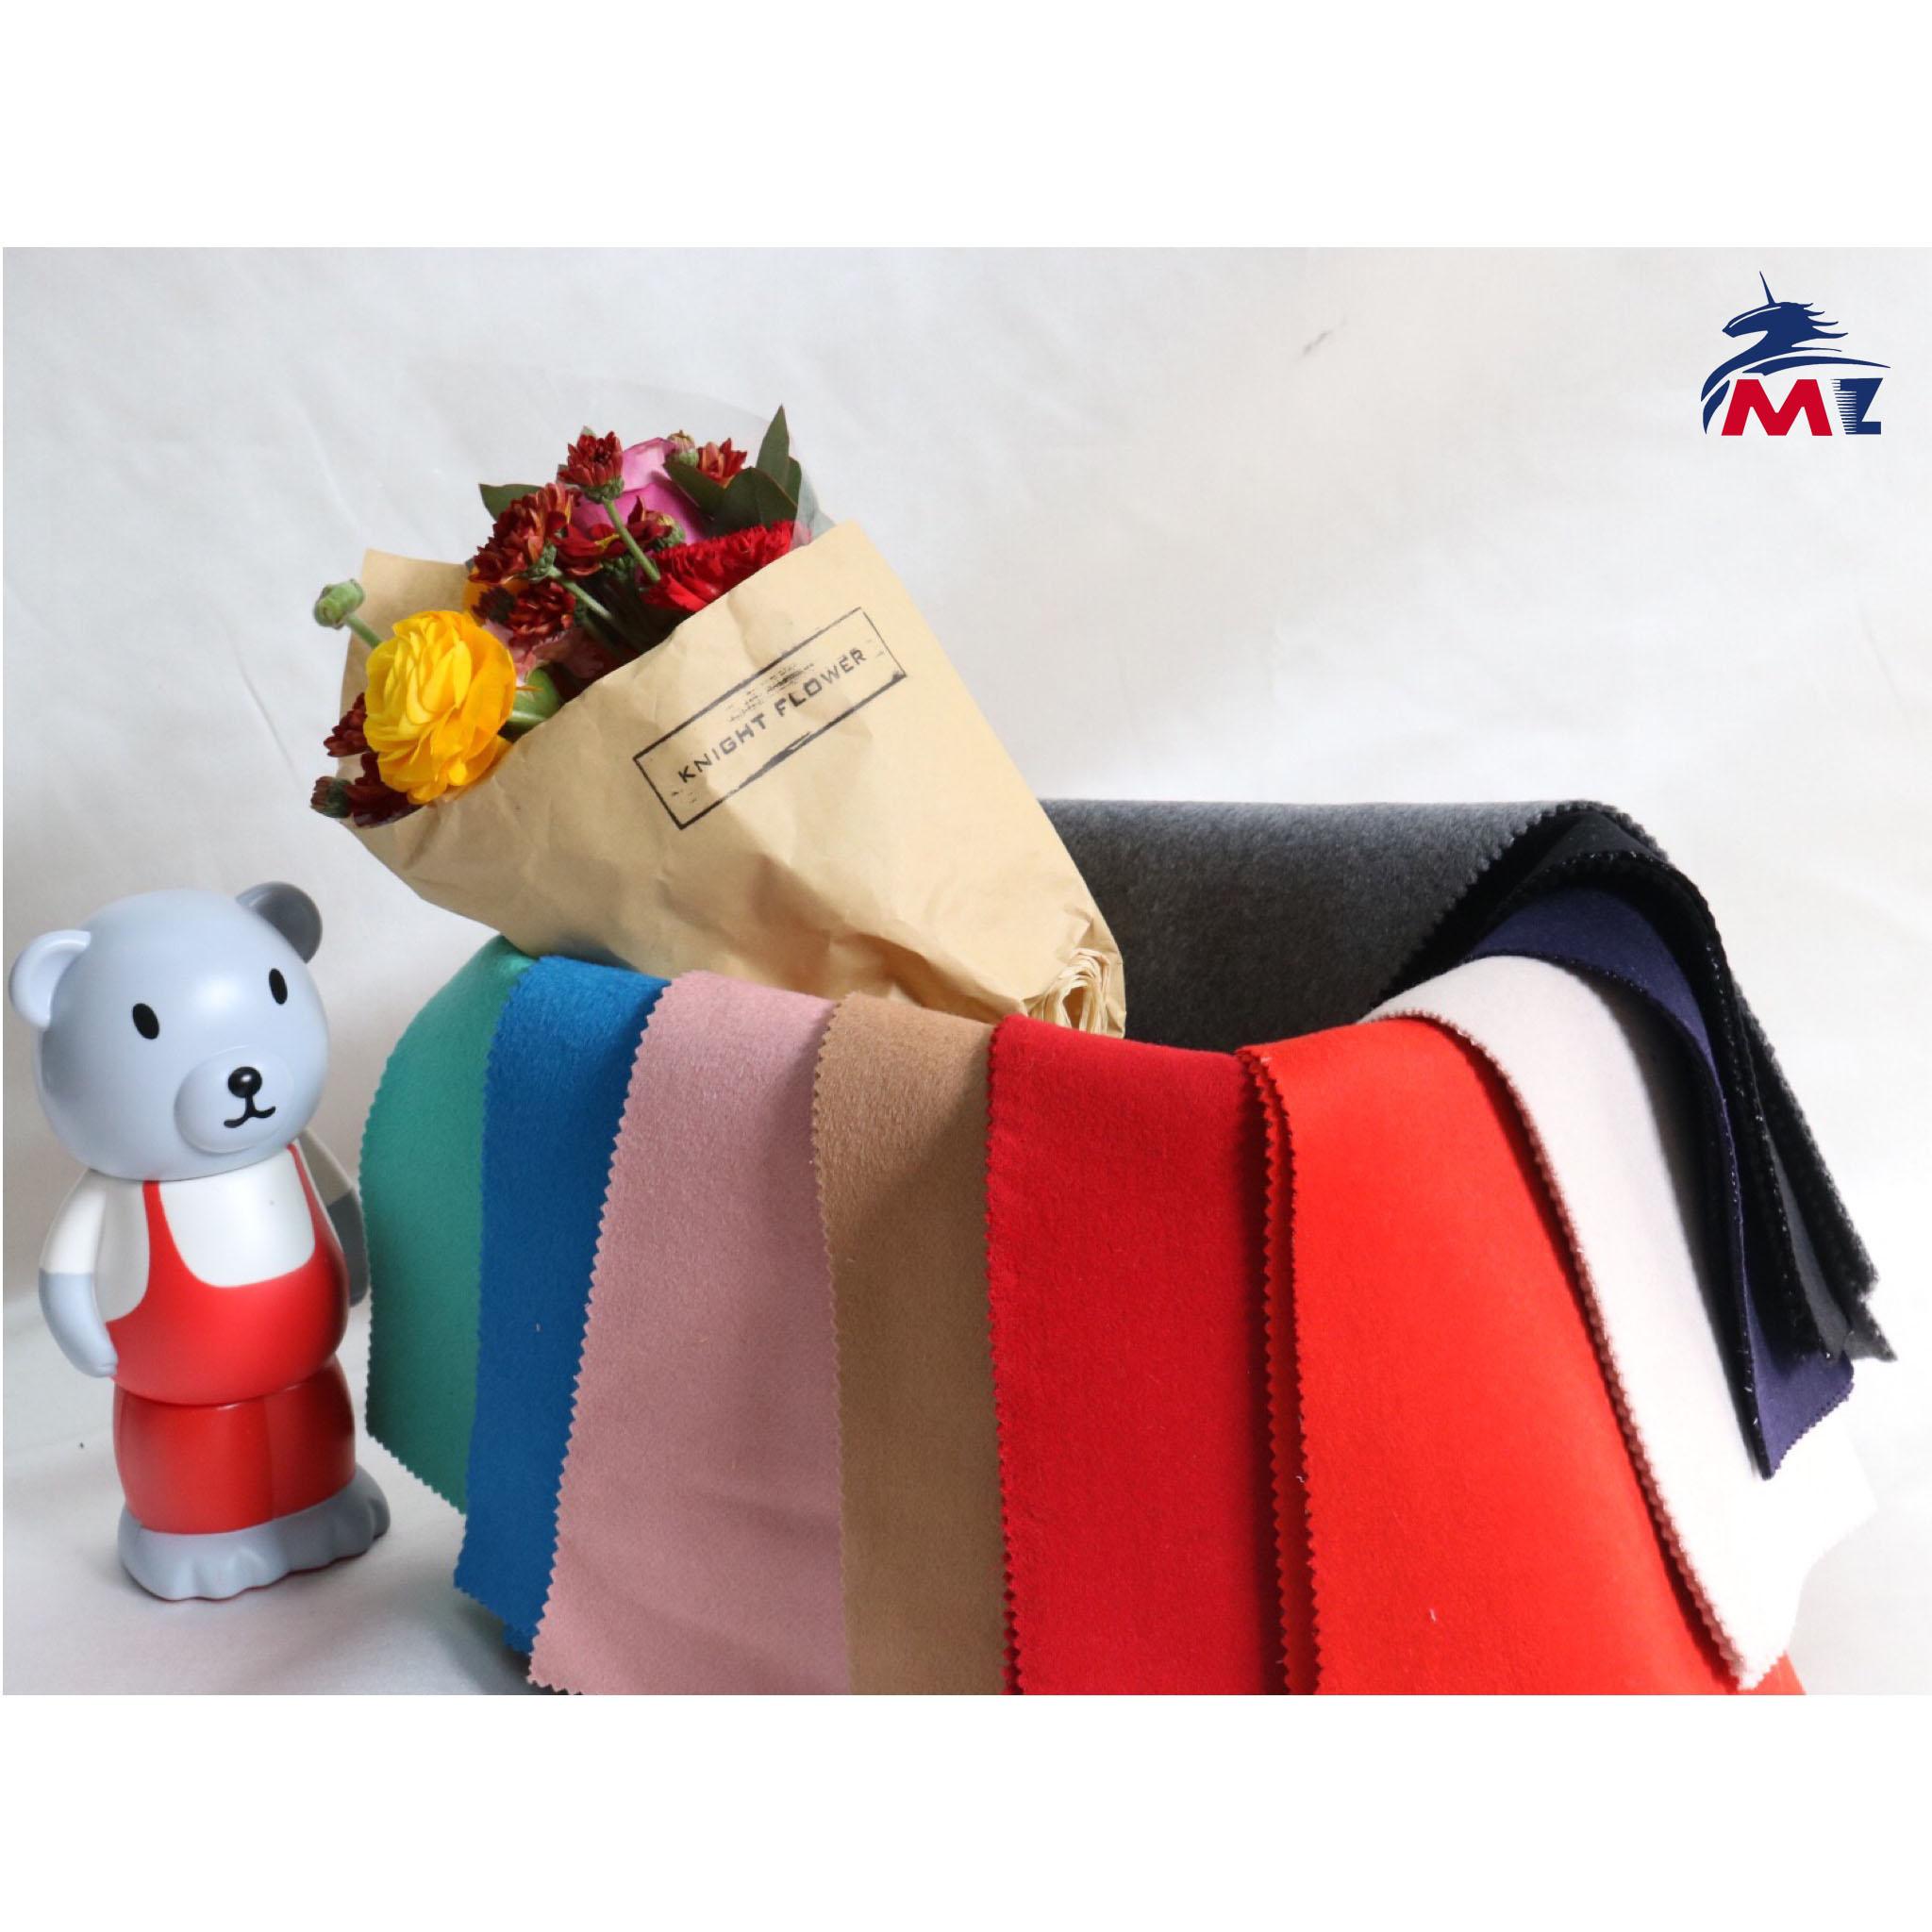 Maze International Trade Wholesale fabric available